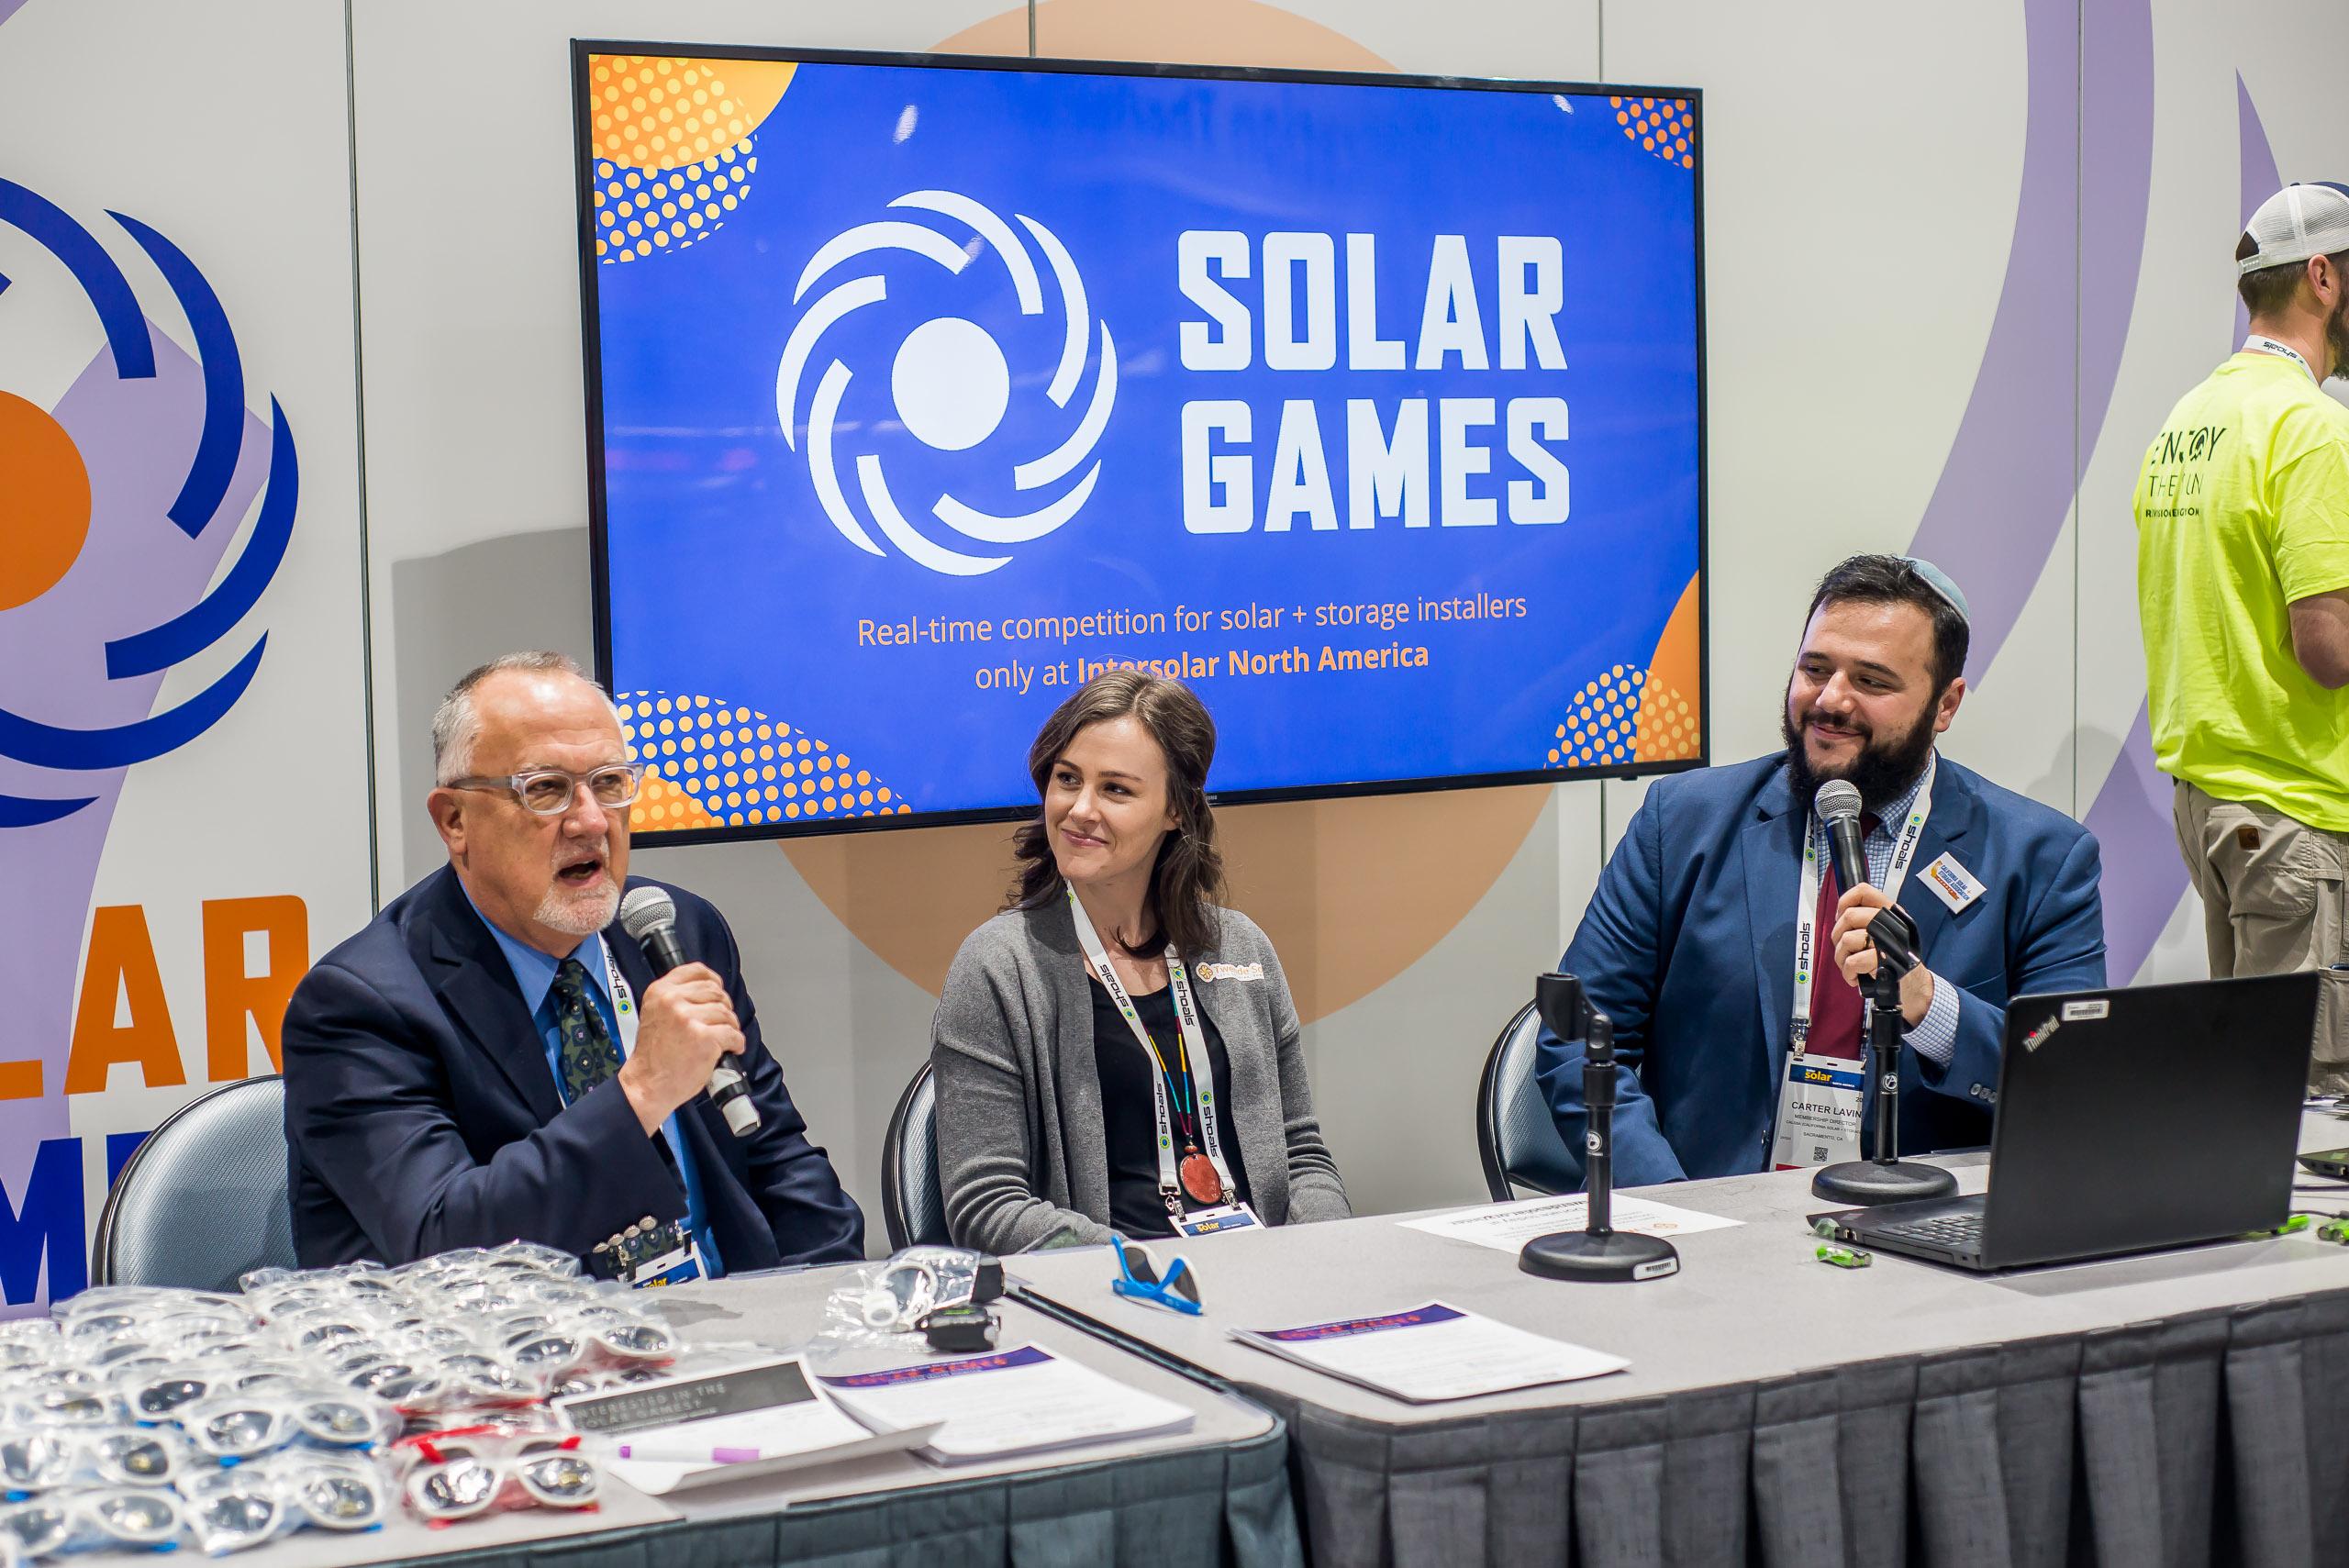 2020 Solar Games